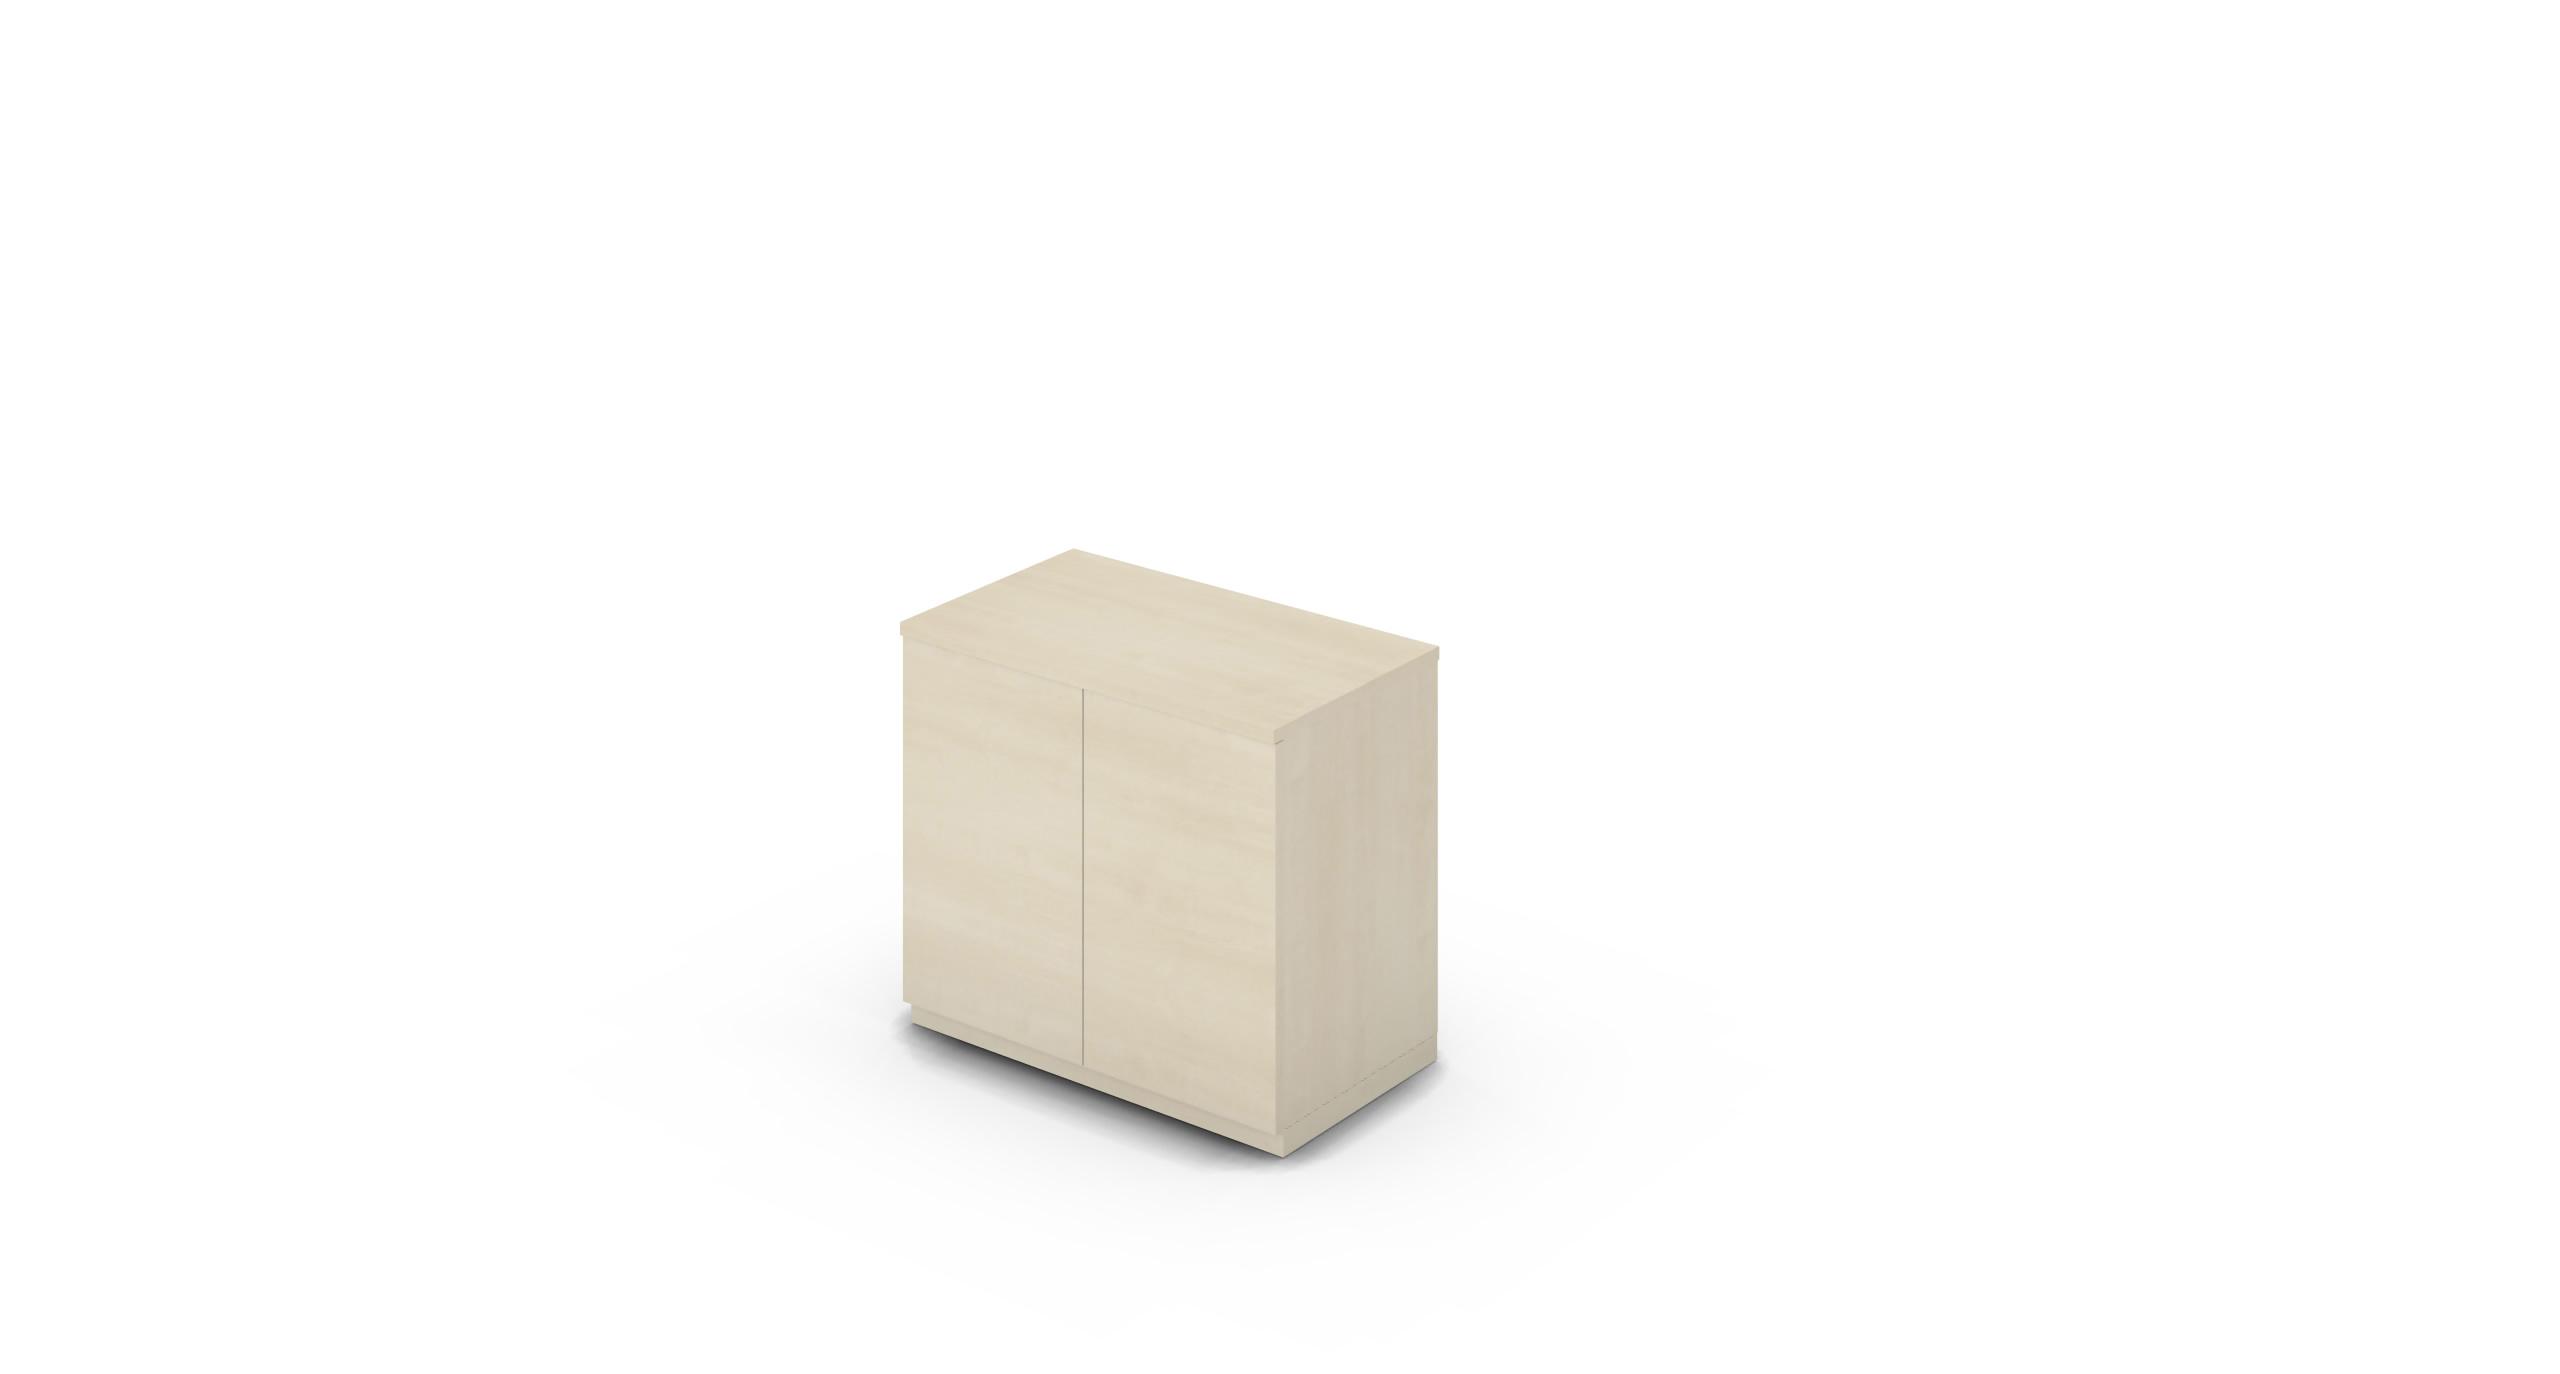 Cabinet_800x450x775_HD_Maple_Push_NoCylinder